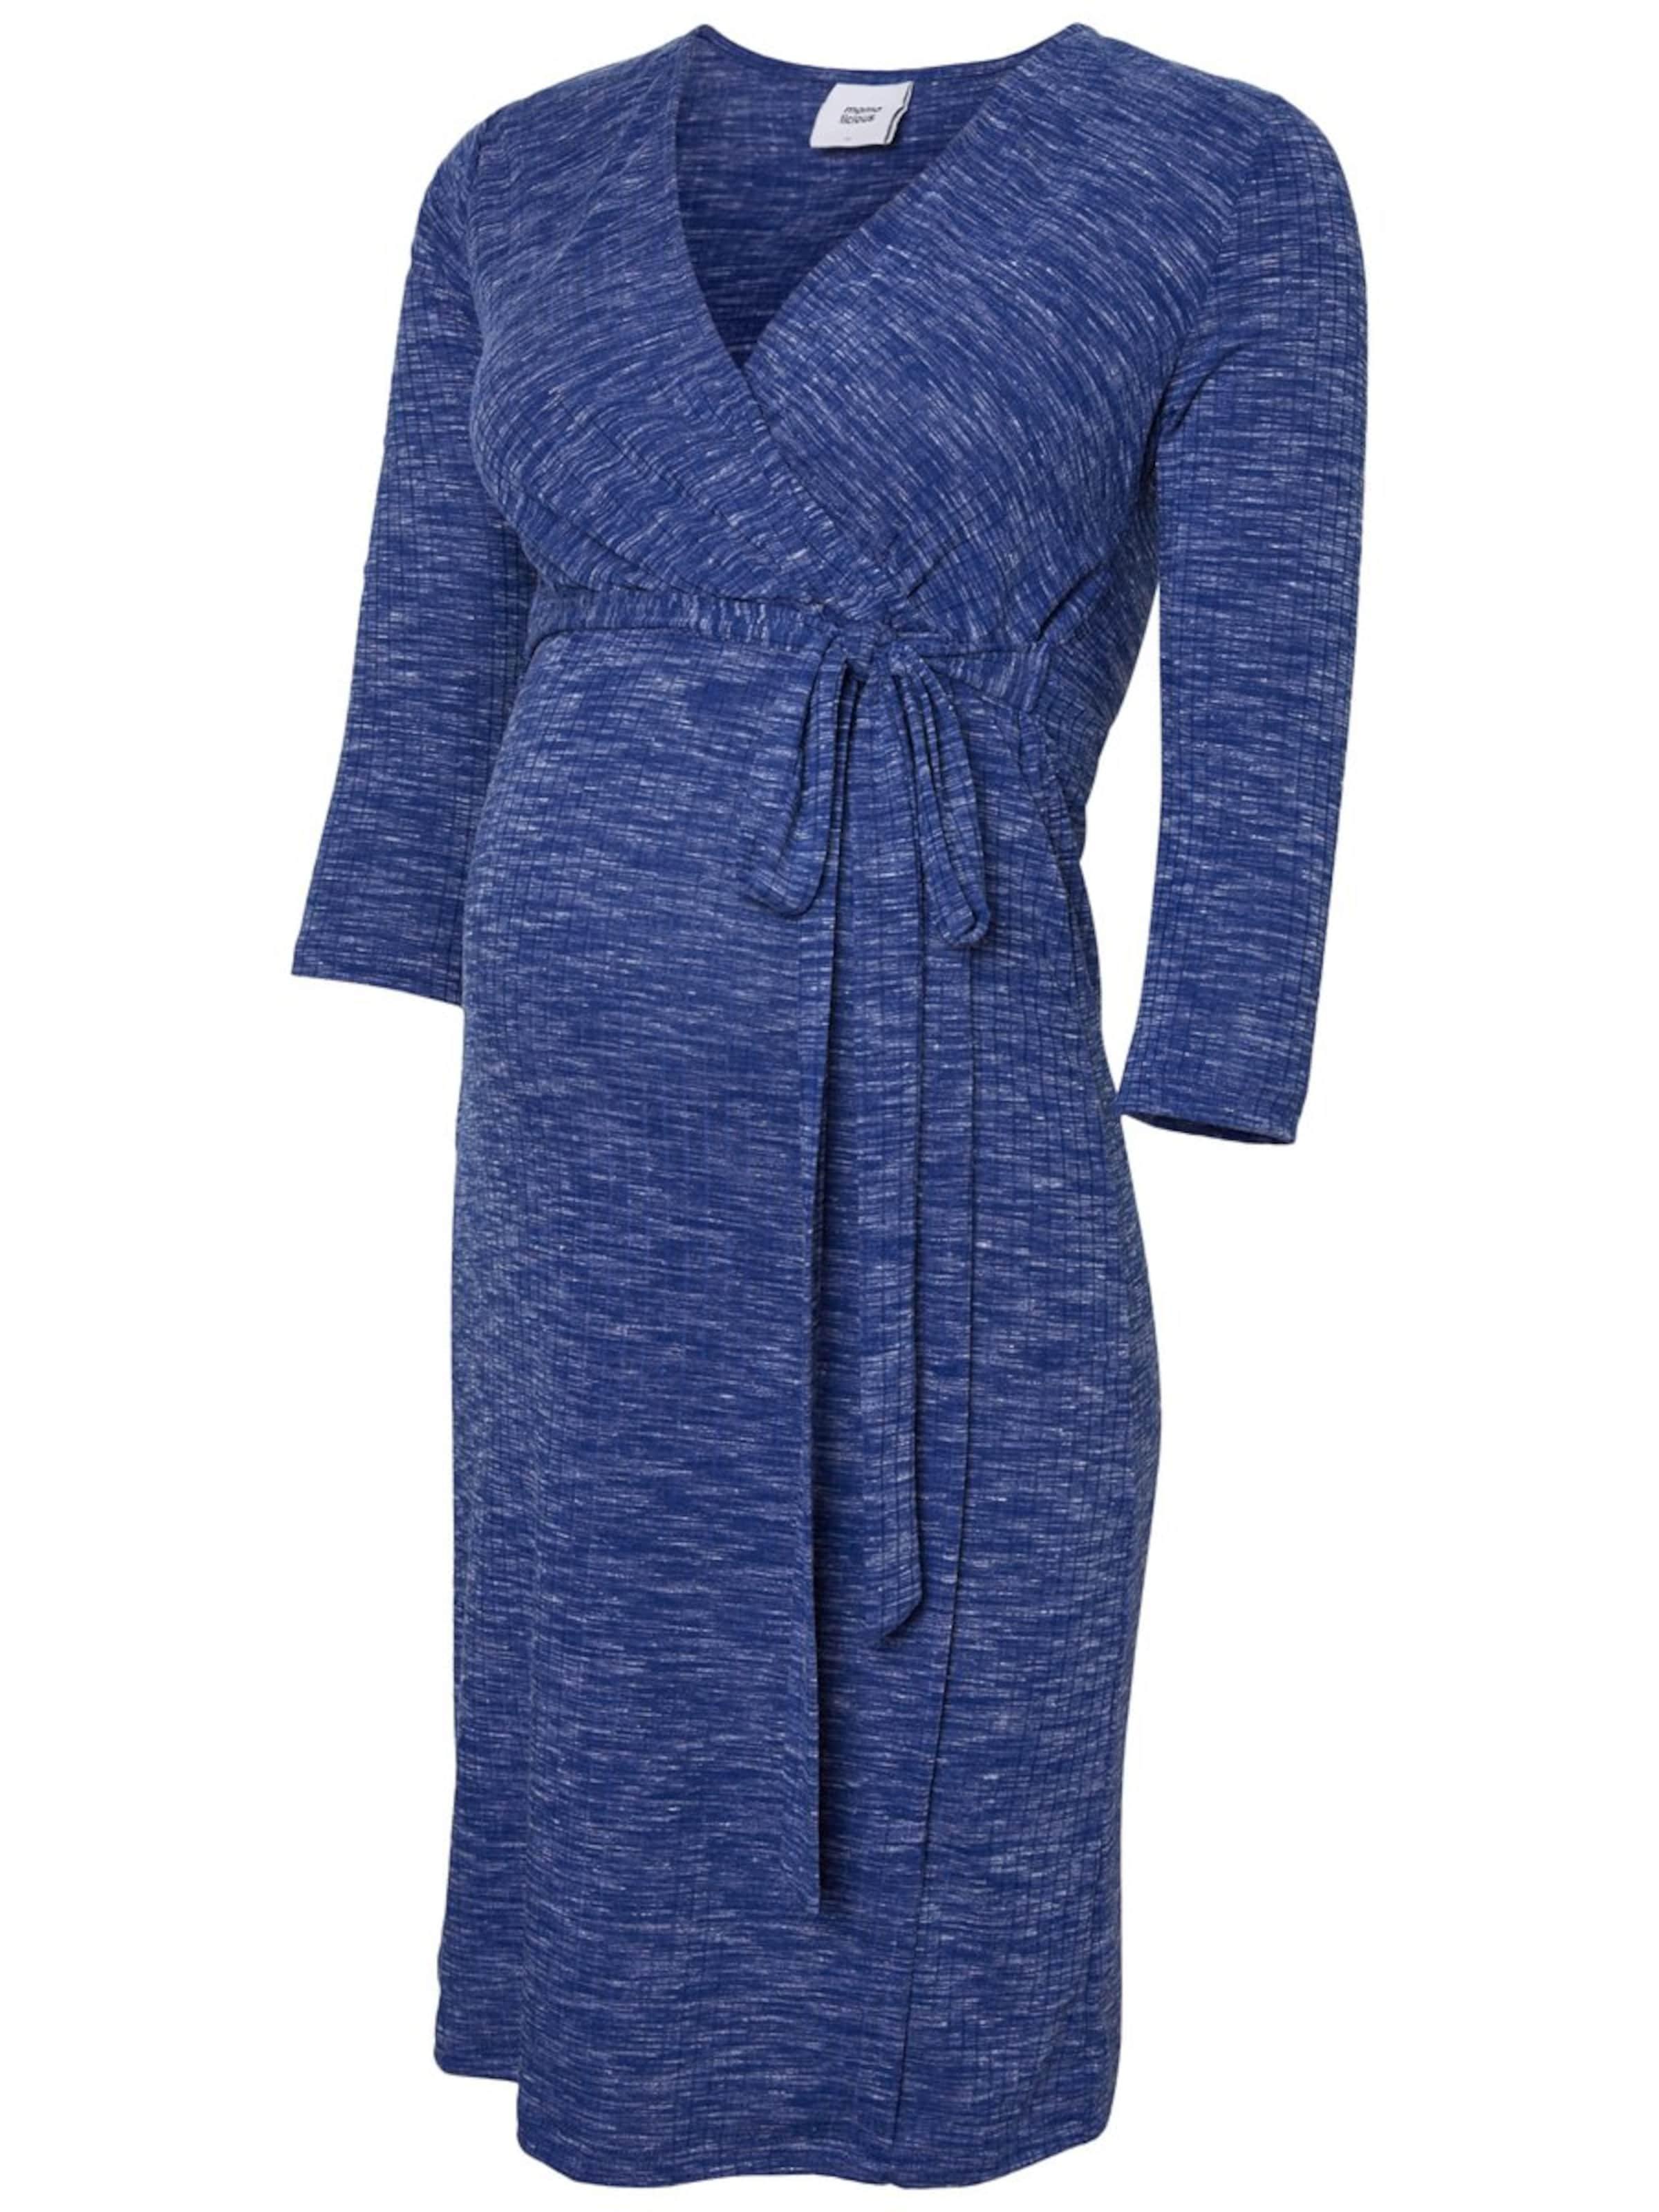 Bleu Chiné En Robe Mamalicious Mamalicious Bleu Robe En H9D2IEW